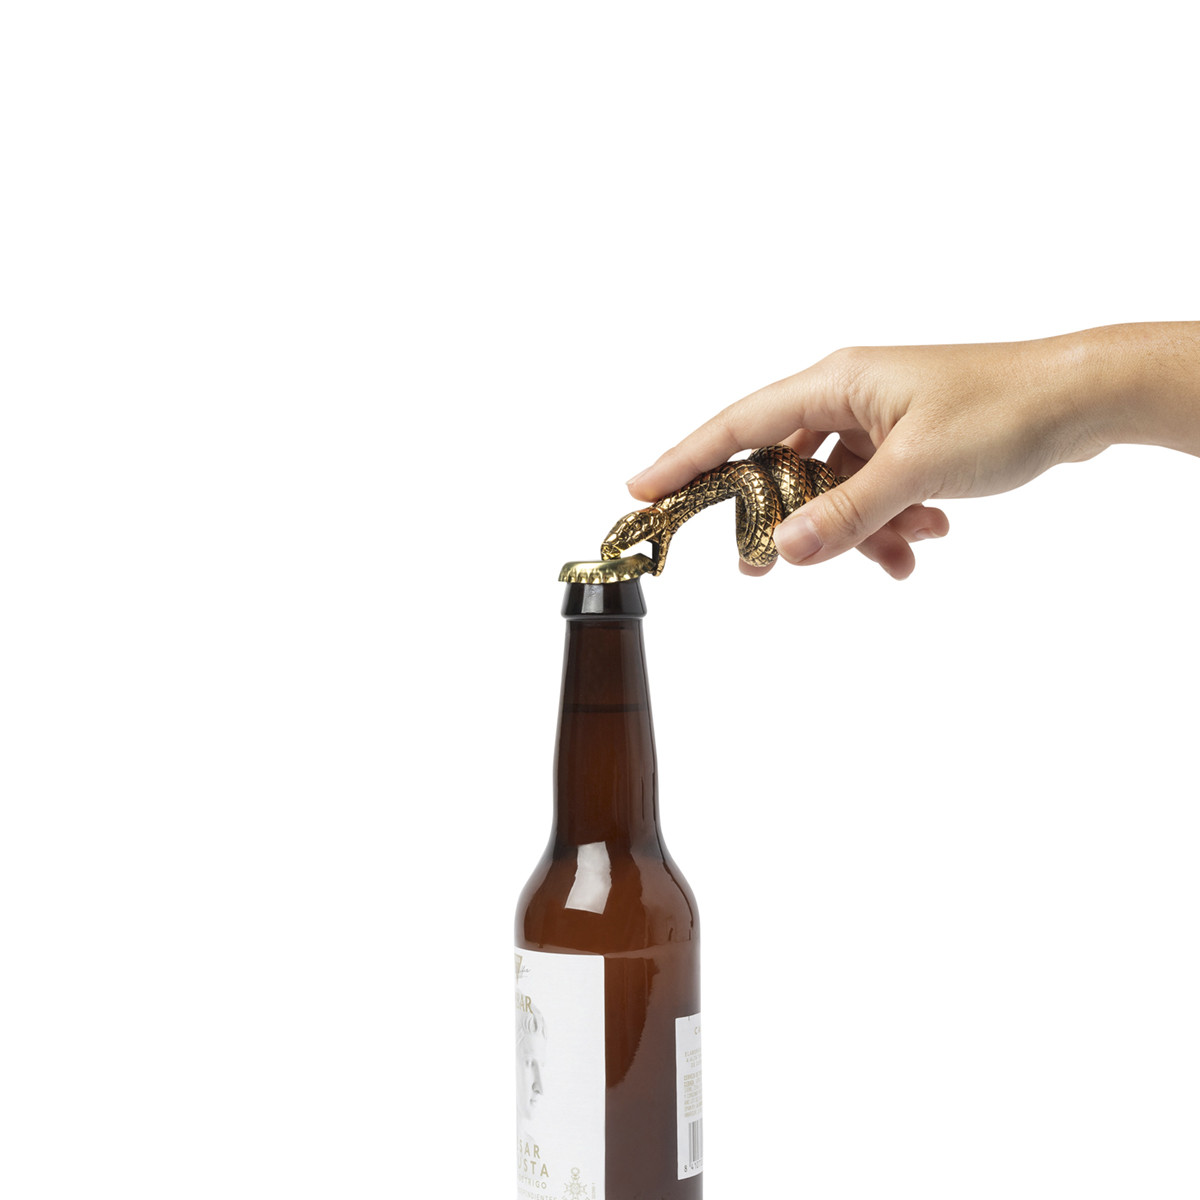 Mamba Bottle Opener in action